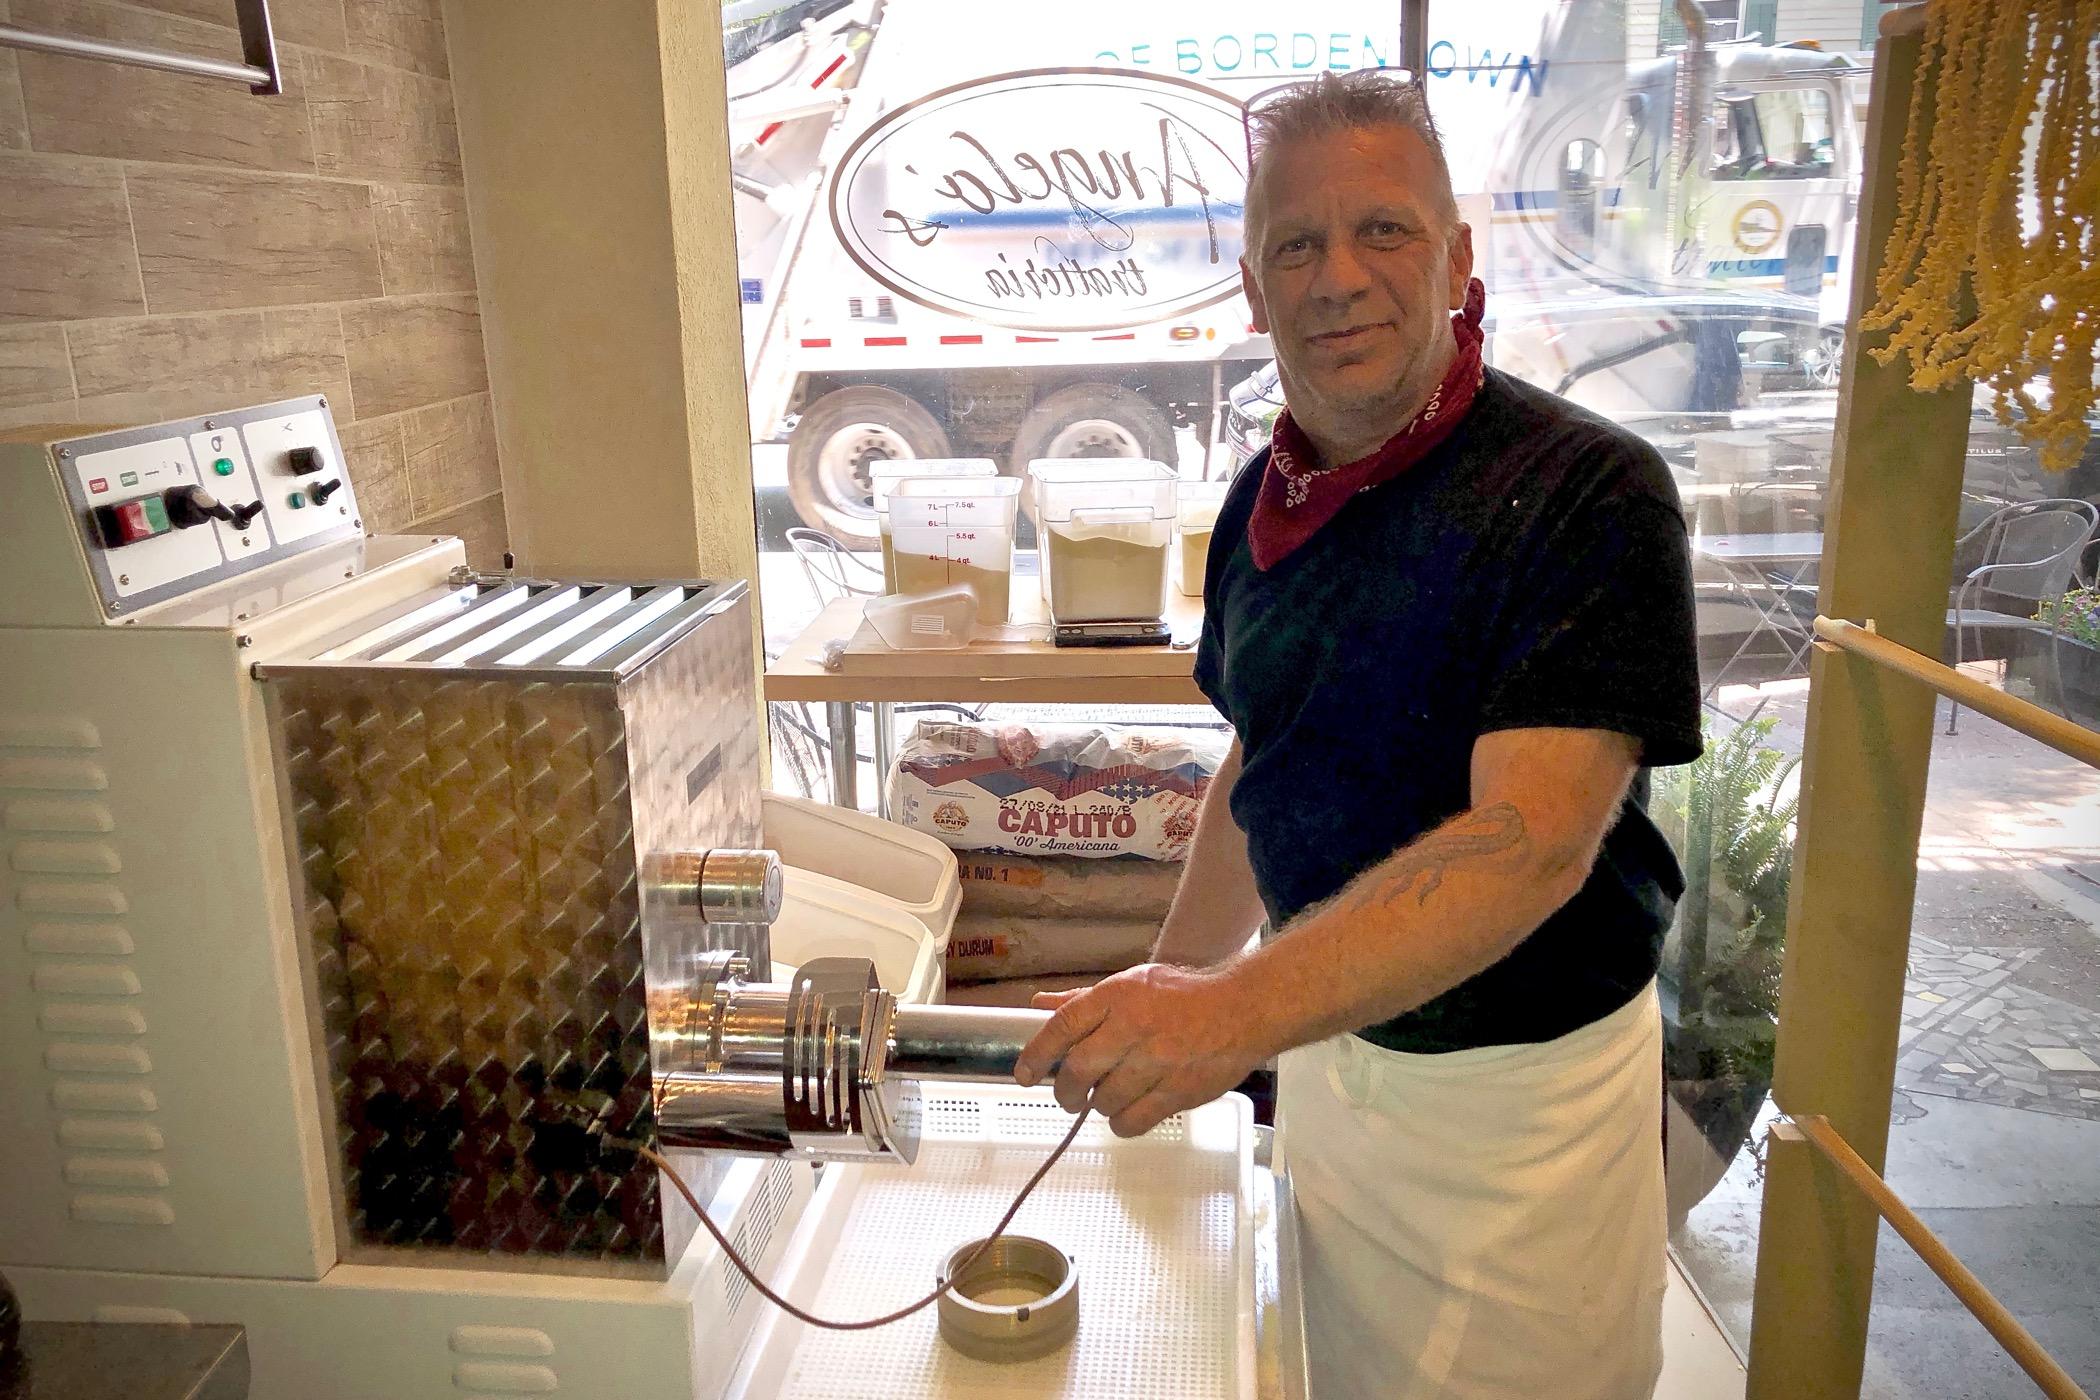 Robert Melker prepares food at Angelo's Trattoria